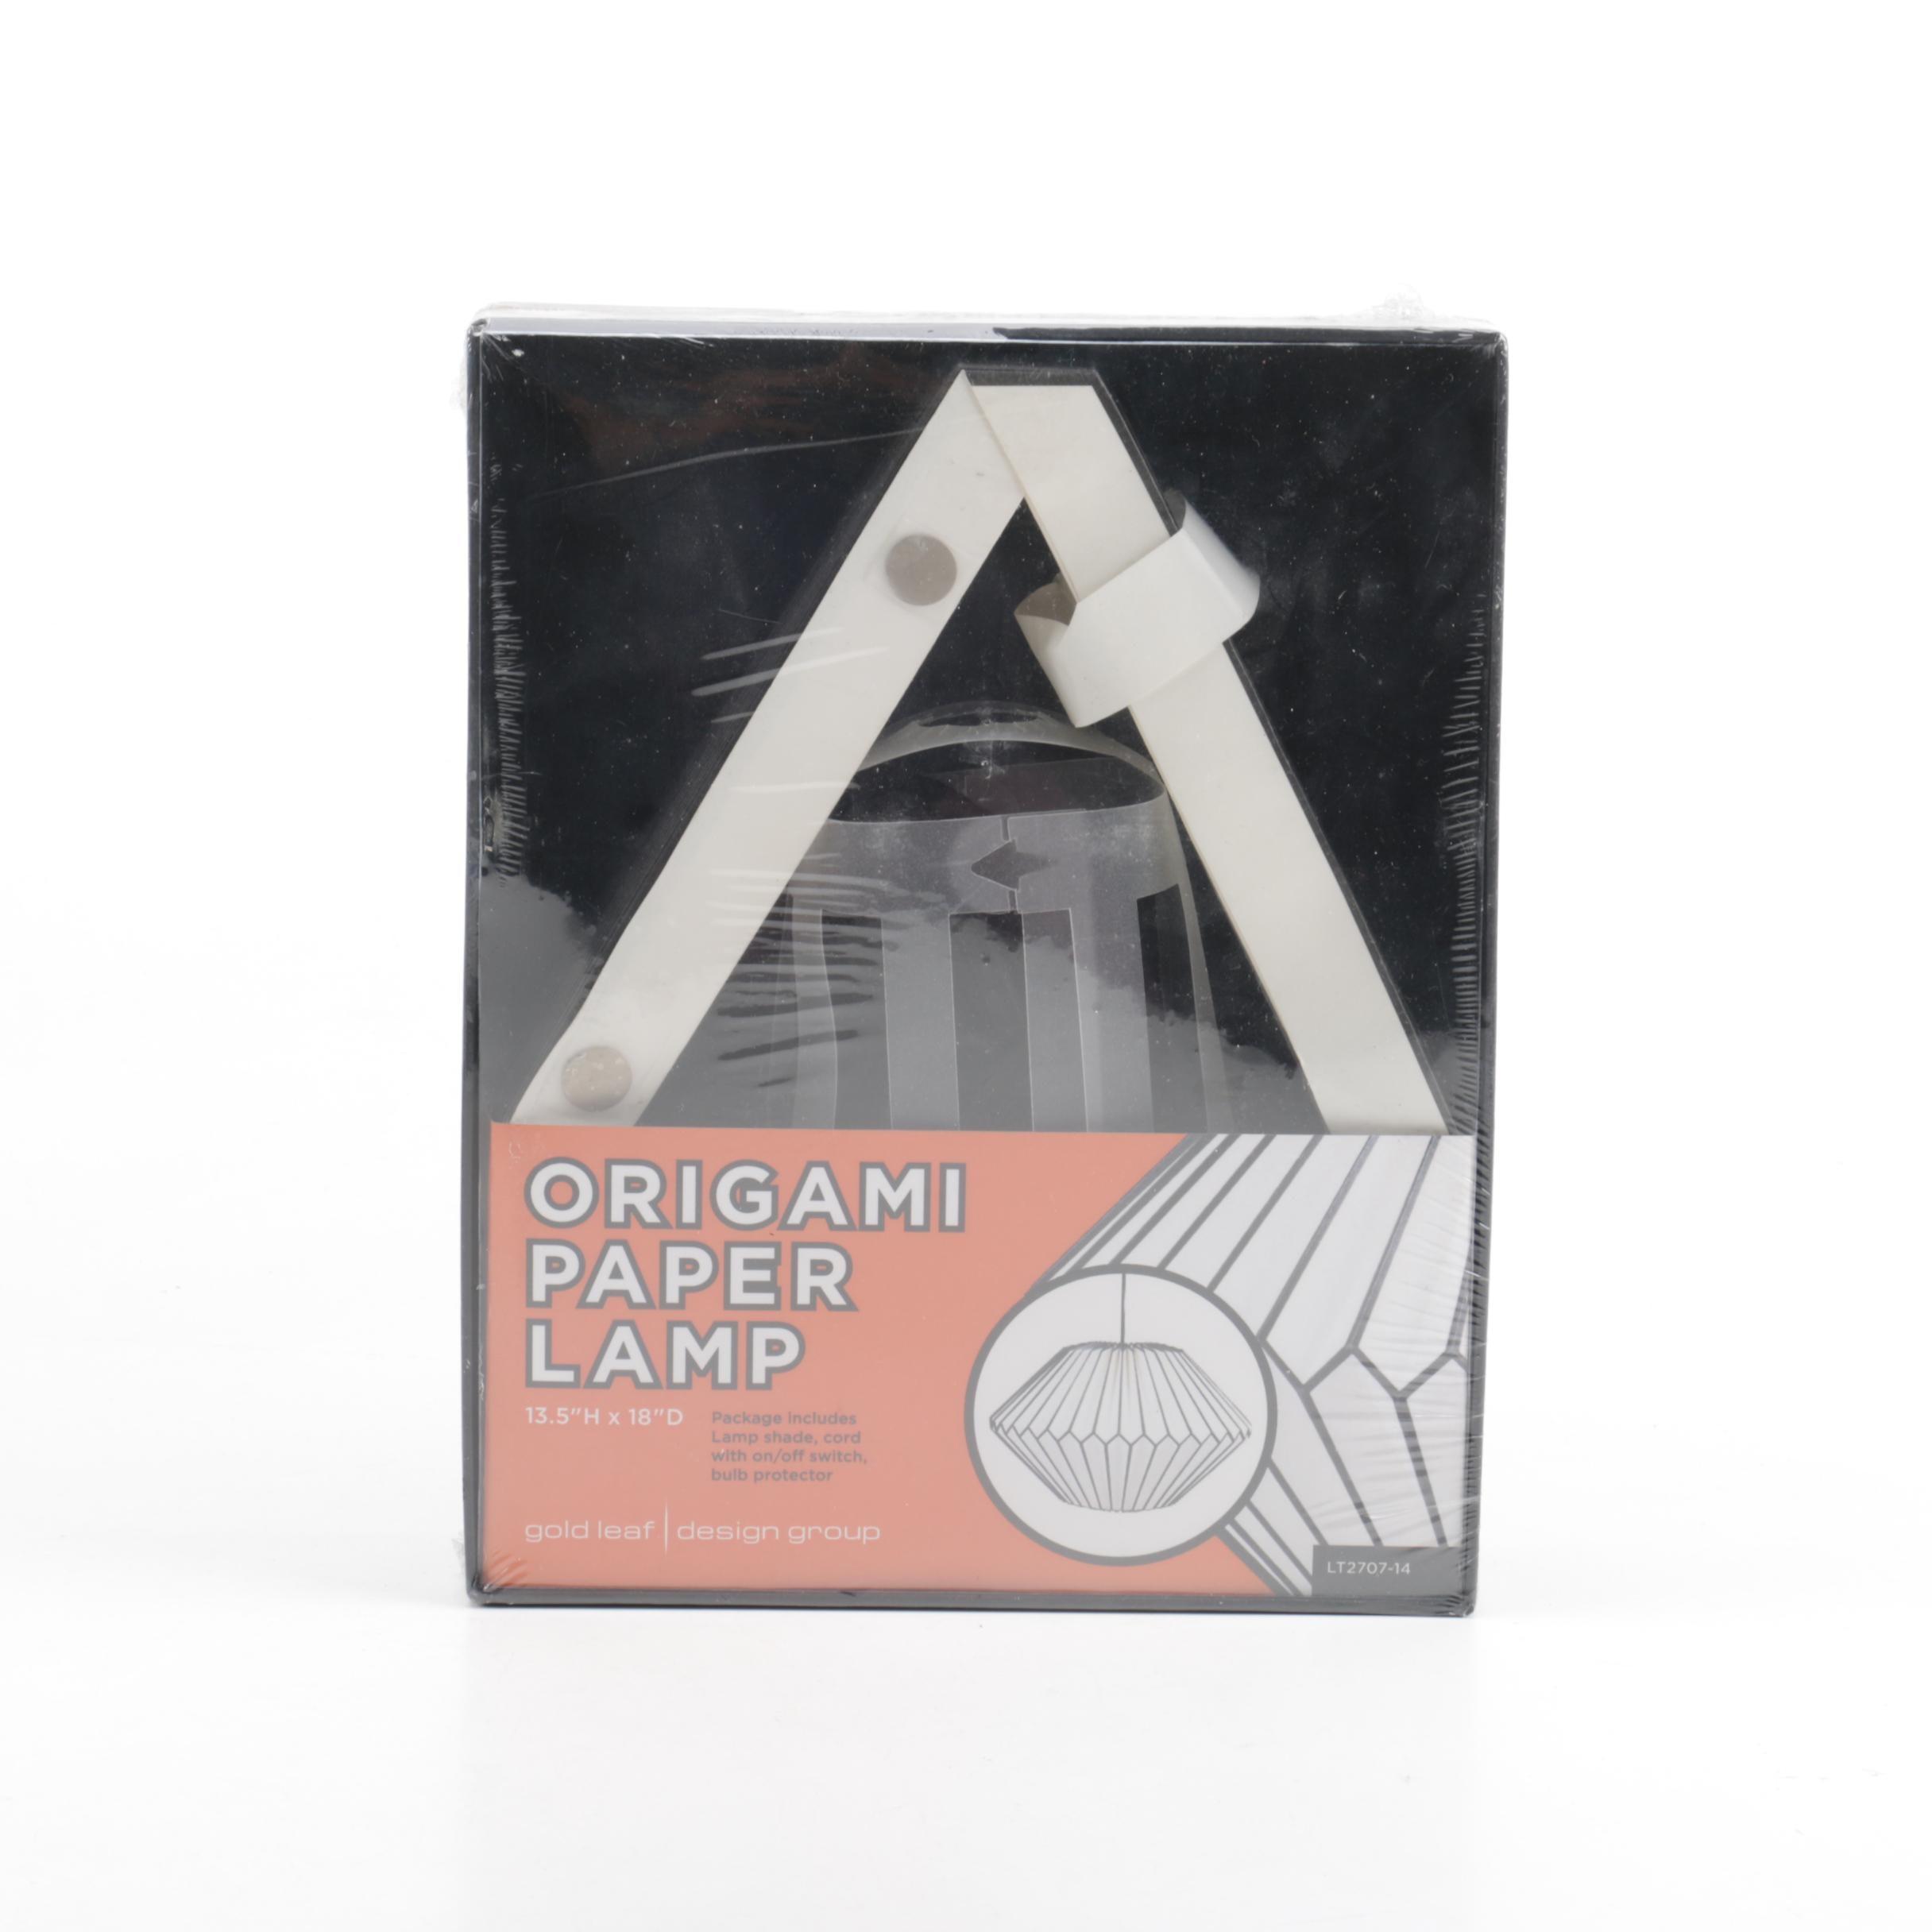 Gold Leaf Design Group Origami Paper Lamp